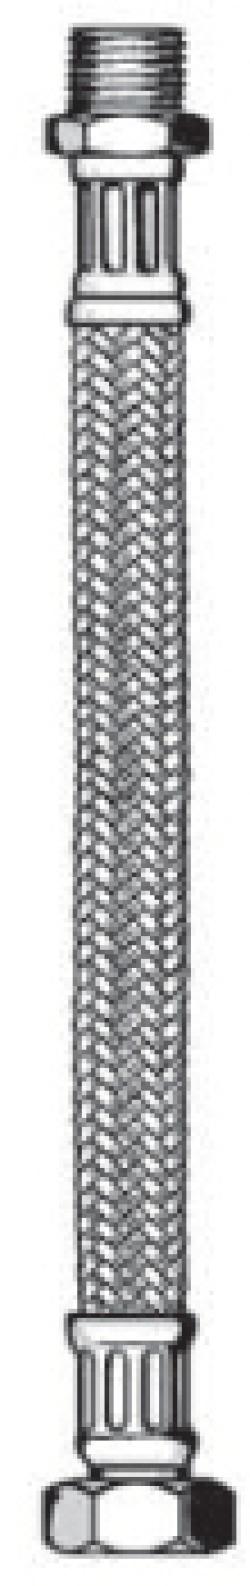 МЕ 5615.1104.80 Meiflex Dn13, 1/2 BPx1/2 HP, 800mm